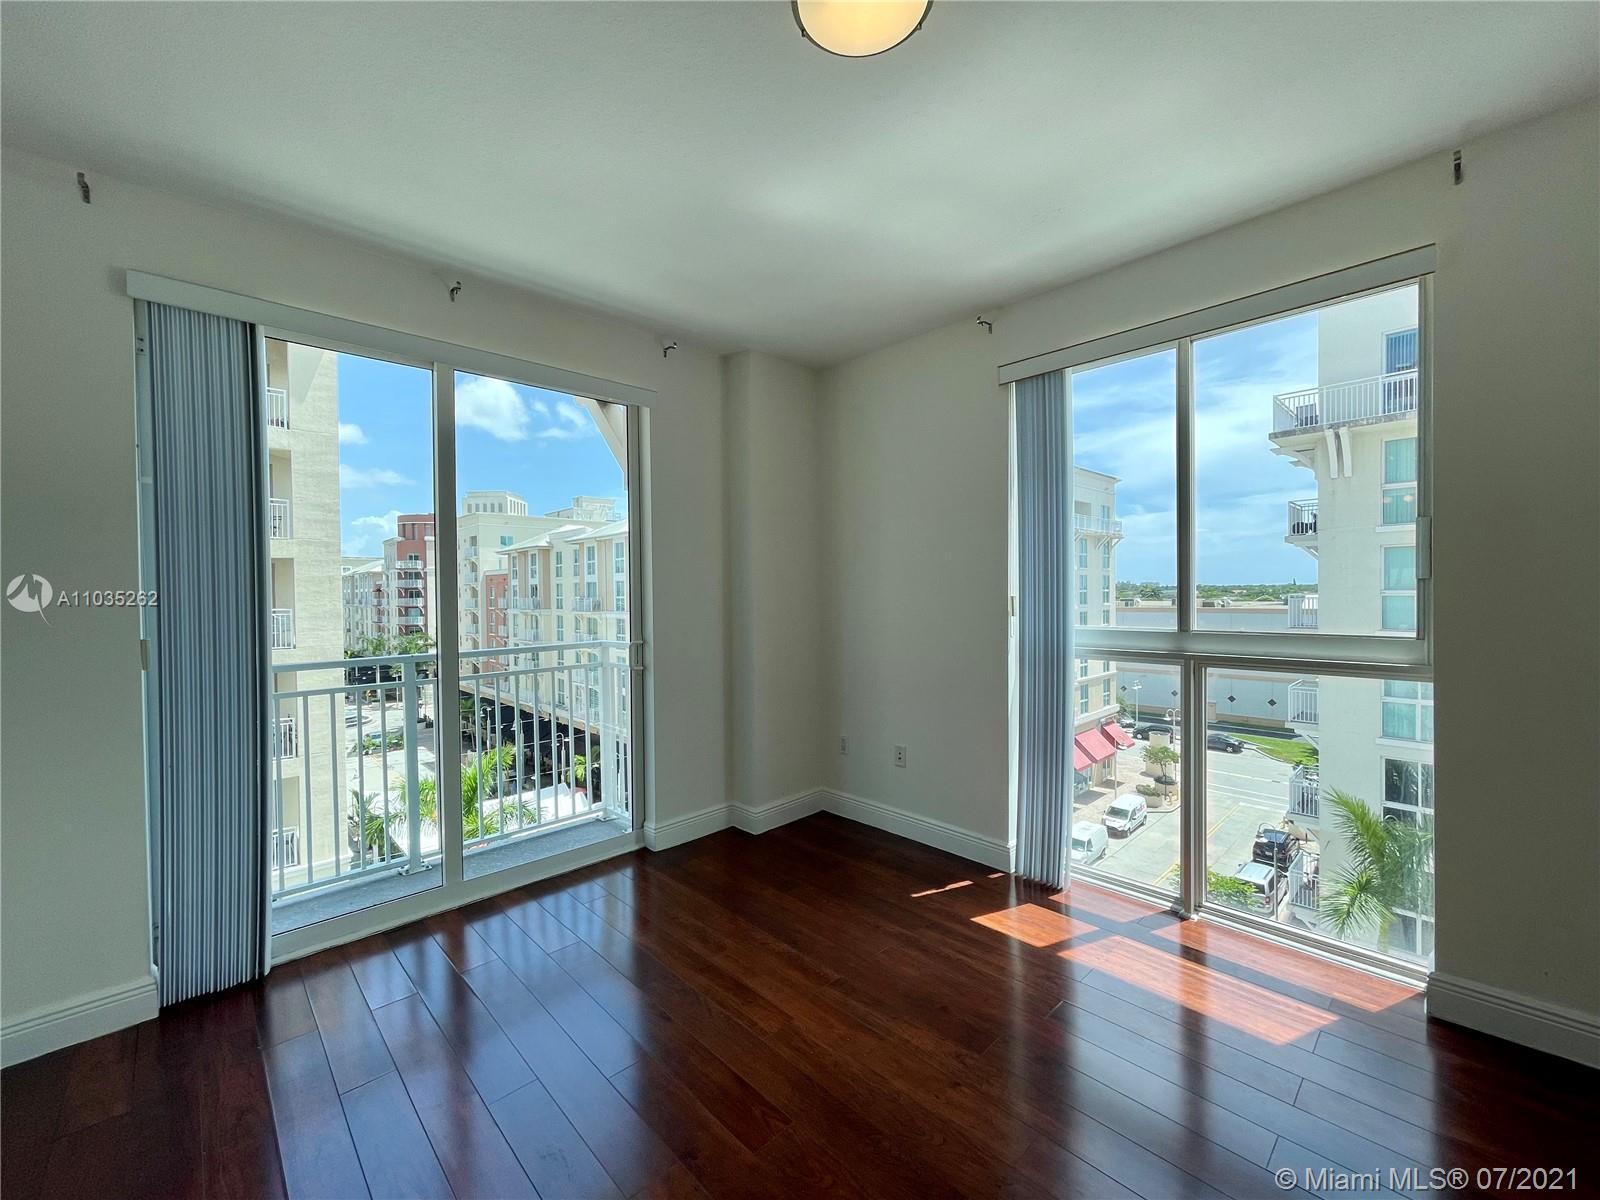 Downtown Dadeland Building F #506 - 7290 SW 90th St #506, Miami, FL 33156